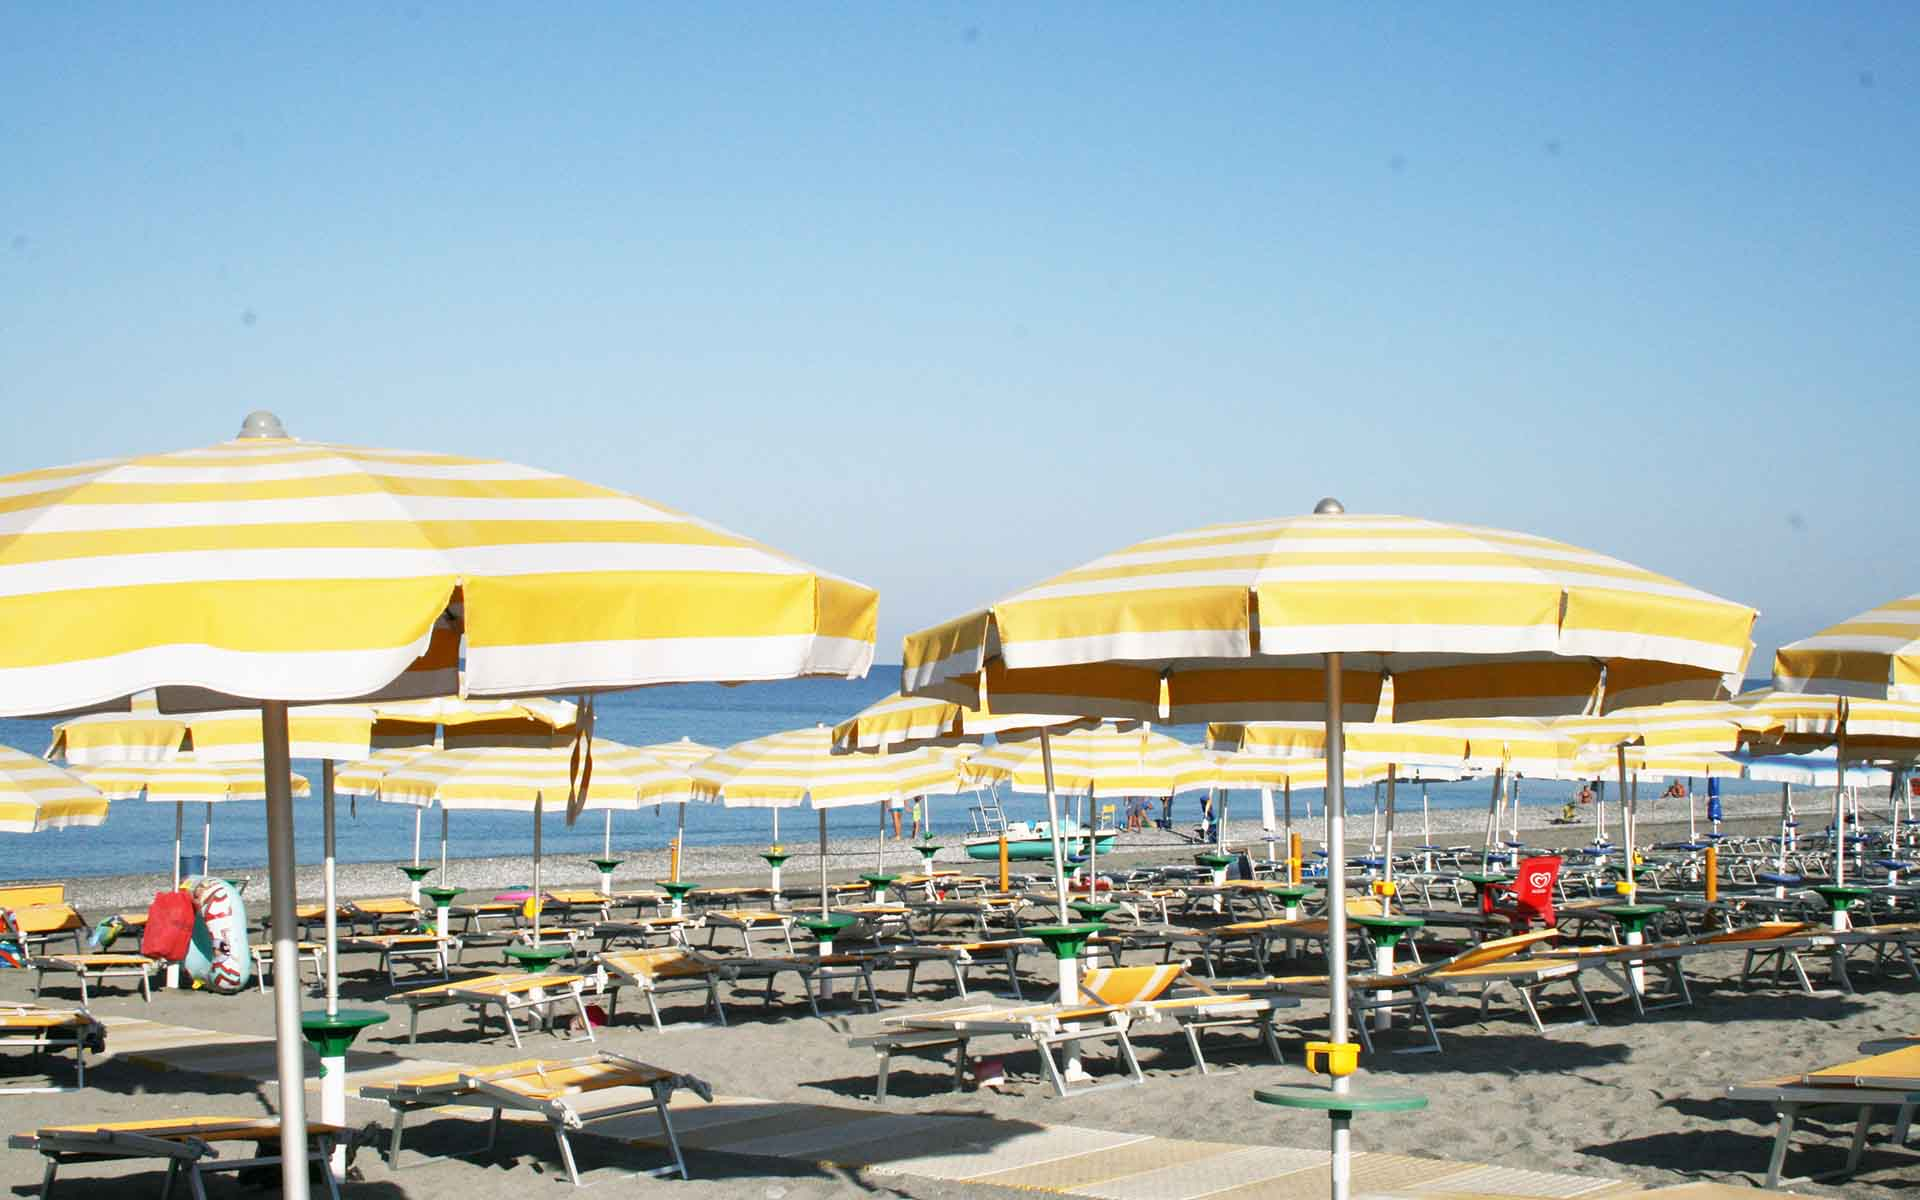 Spiaggia - Stabilimento balneare Hotel Residence Turium